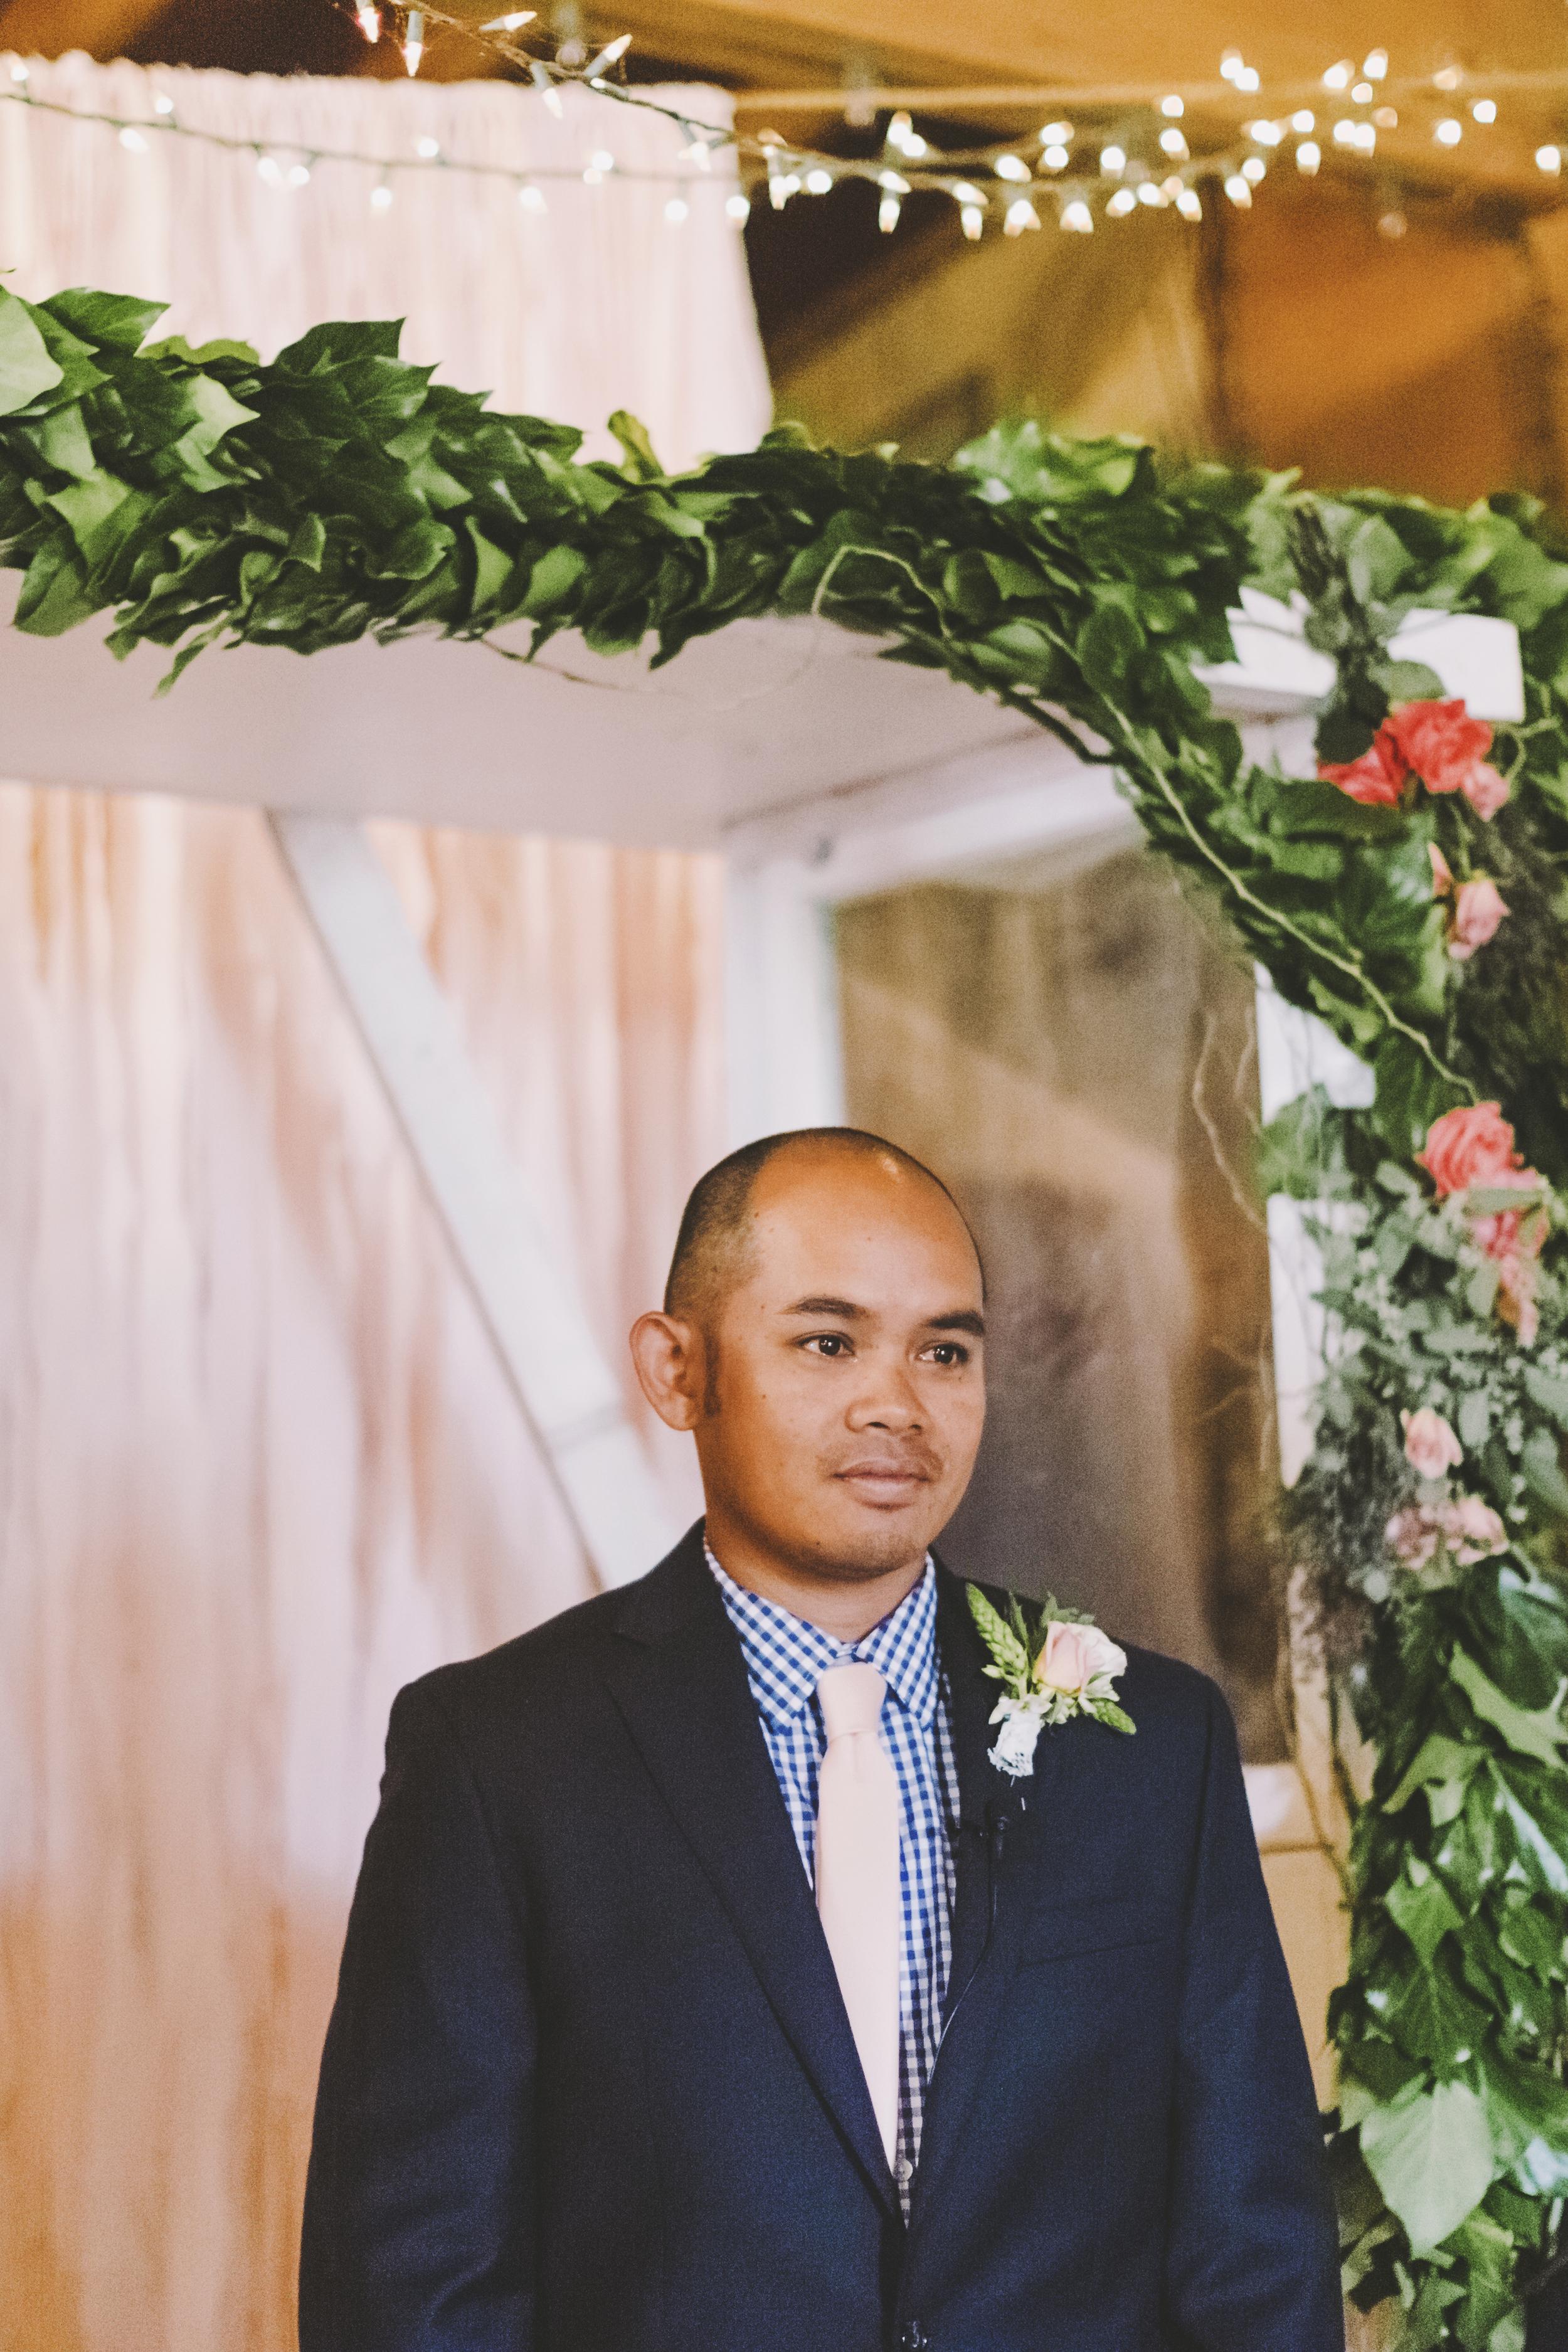 angie-diaz-photography-oahu-hawaii-wedding-tradewinds-ranch-50.jpg